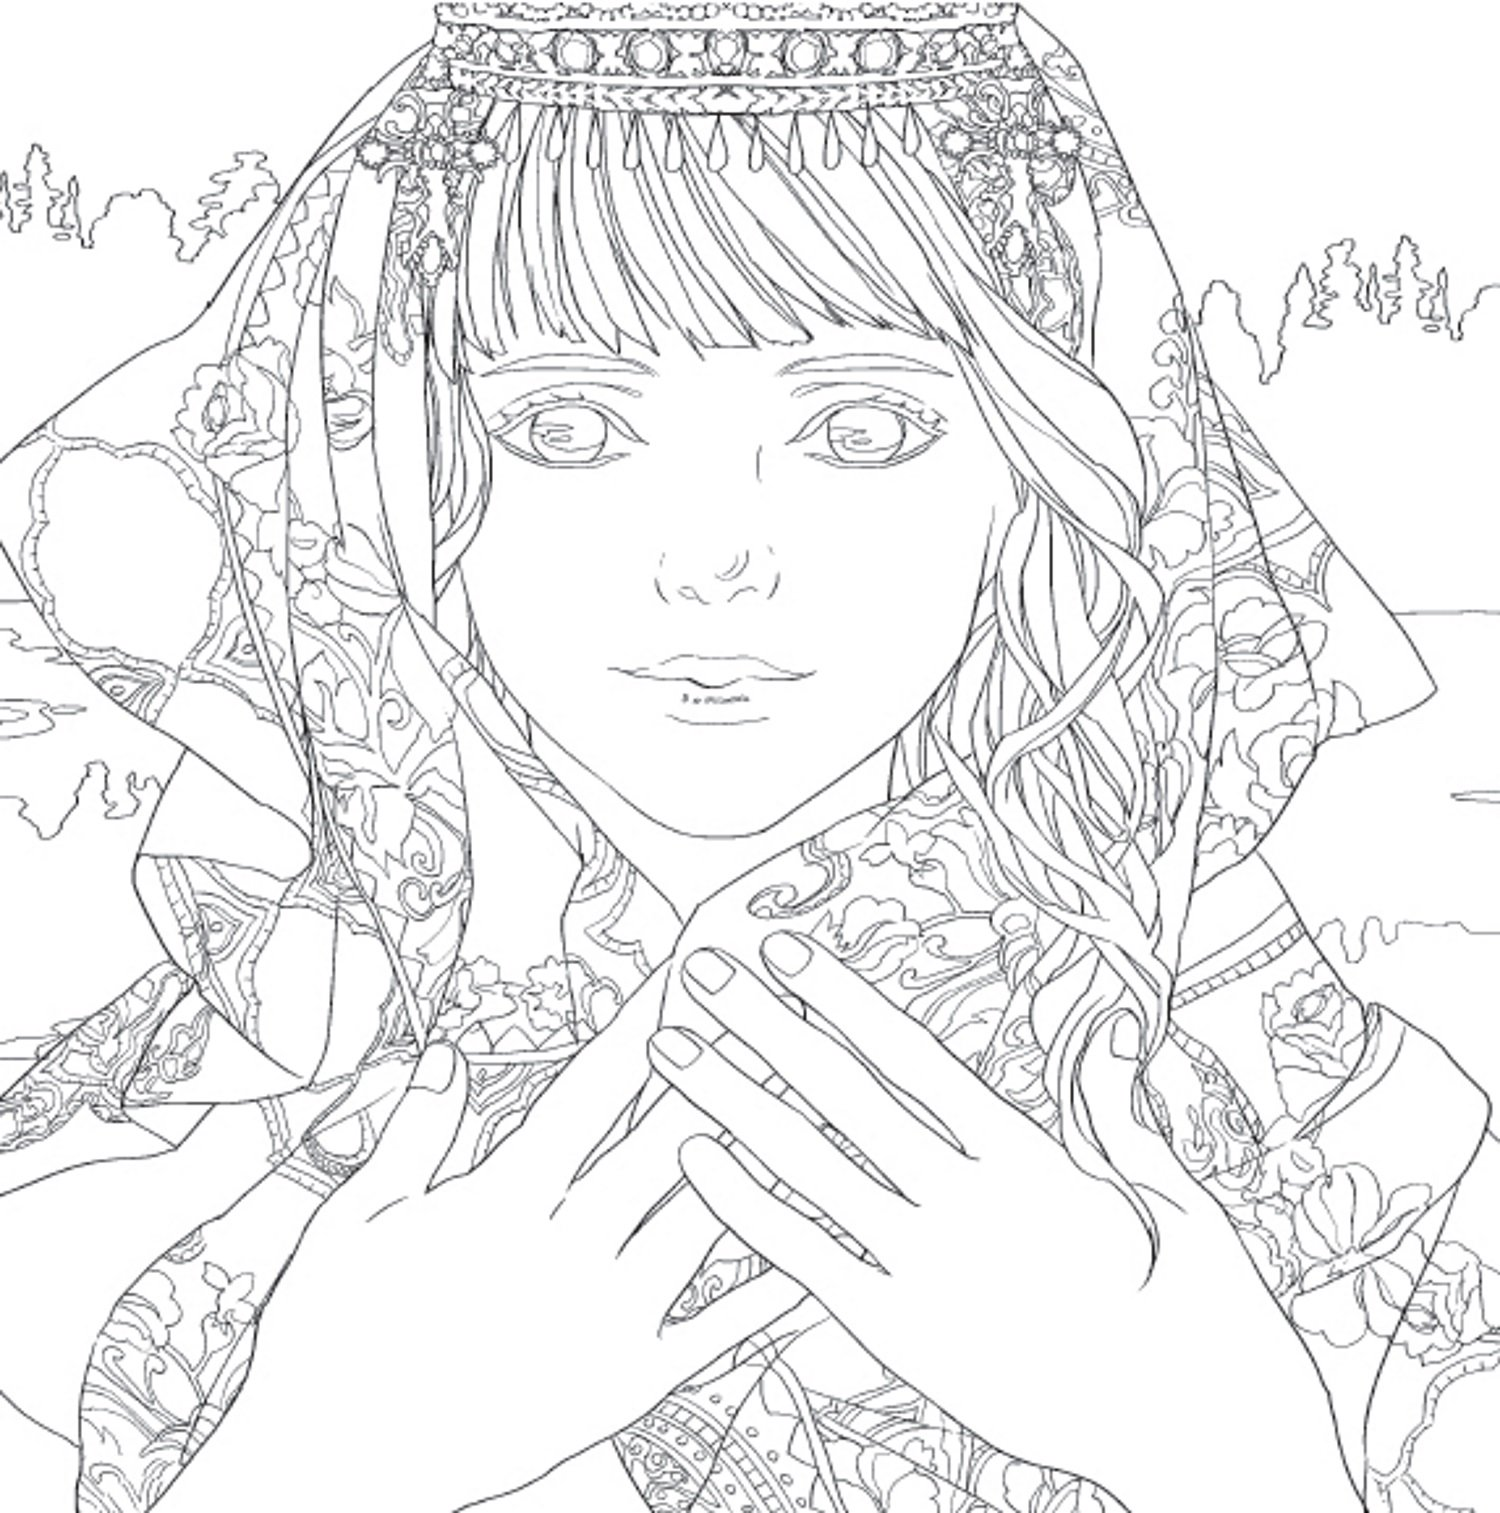 color the classics the snow queen a frozen fantasy coloring book jae eun lee 9781626923997 amazoncom books